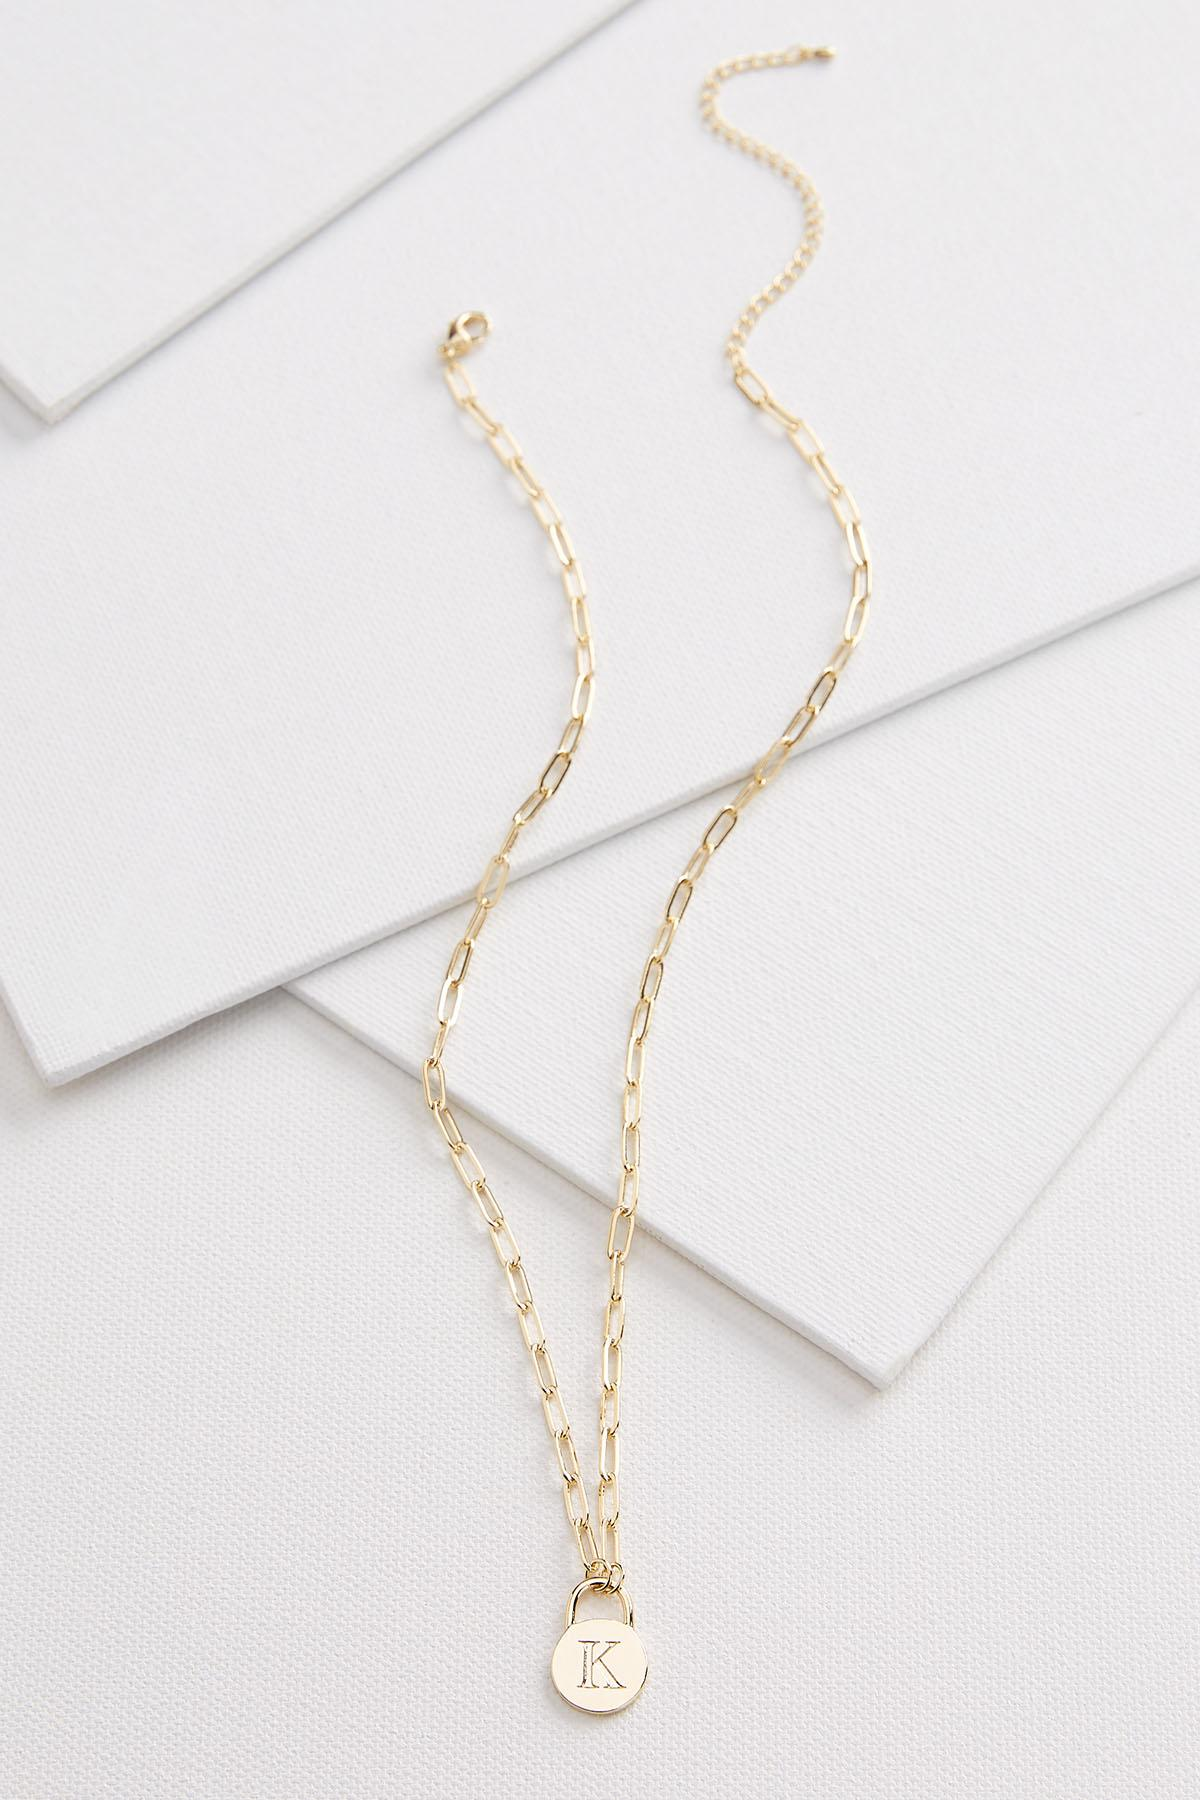 18k K Pendant Necklace